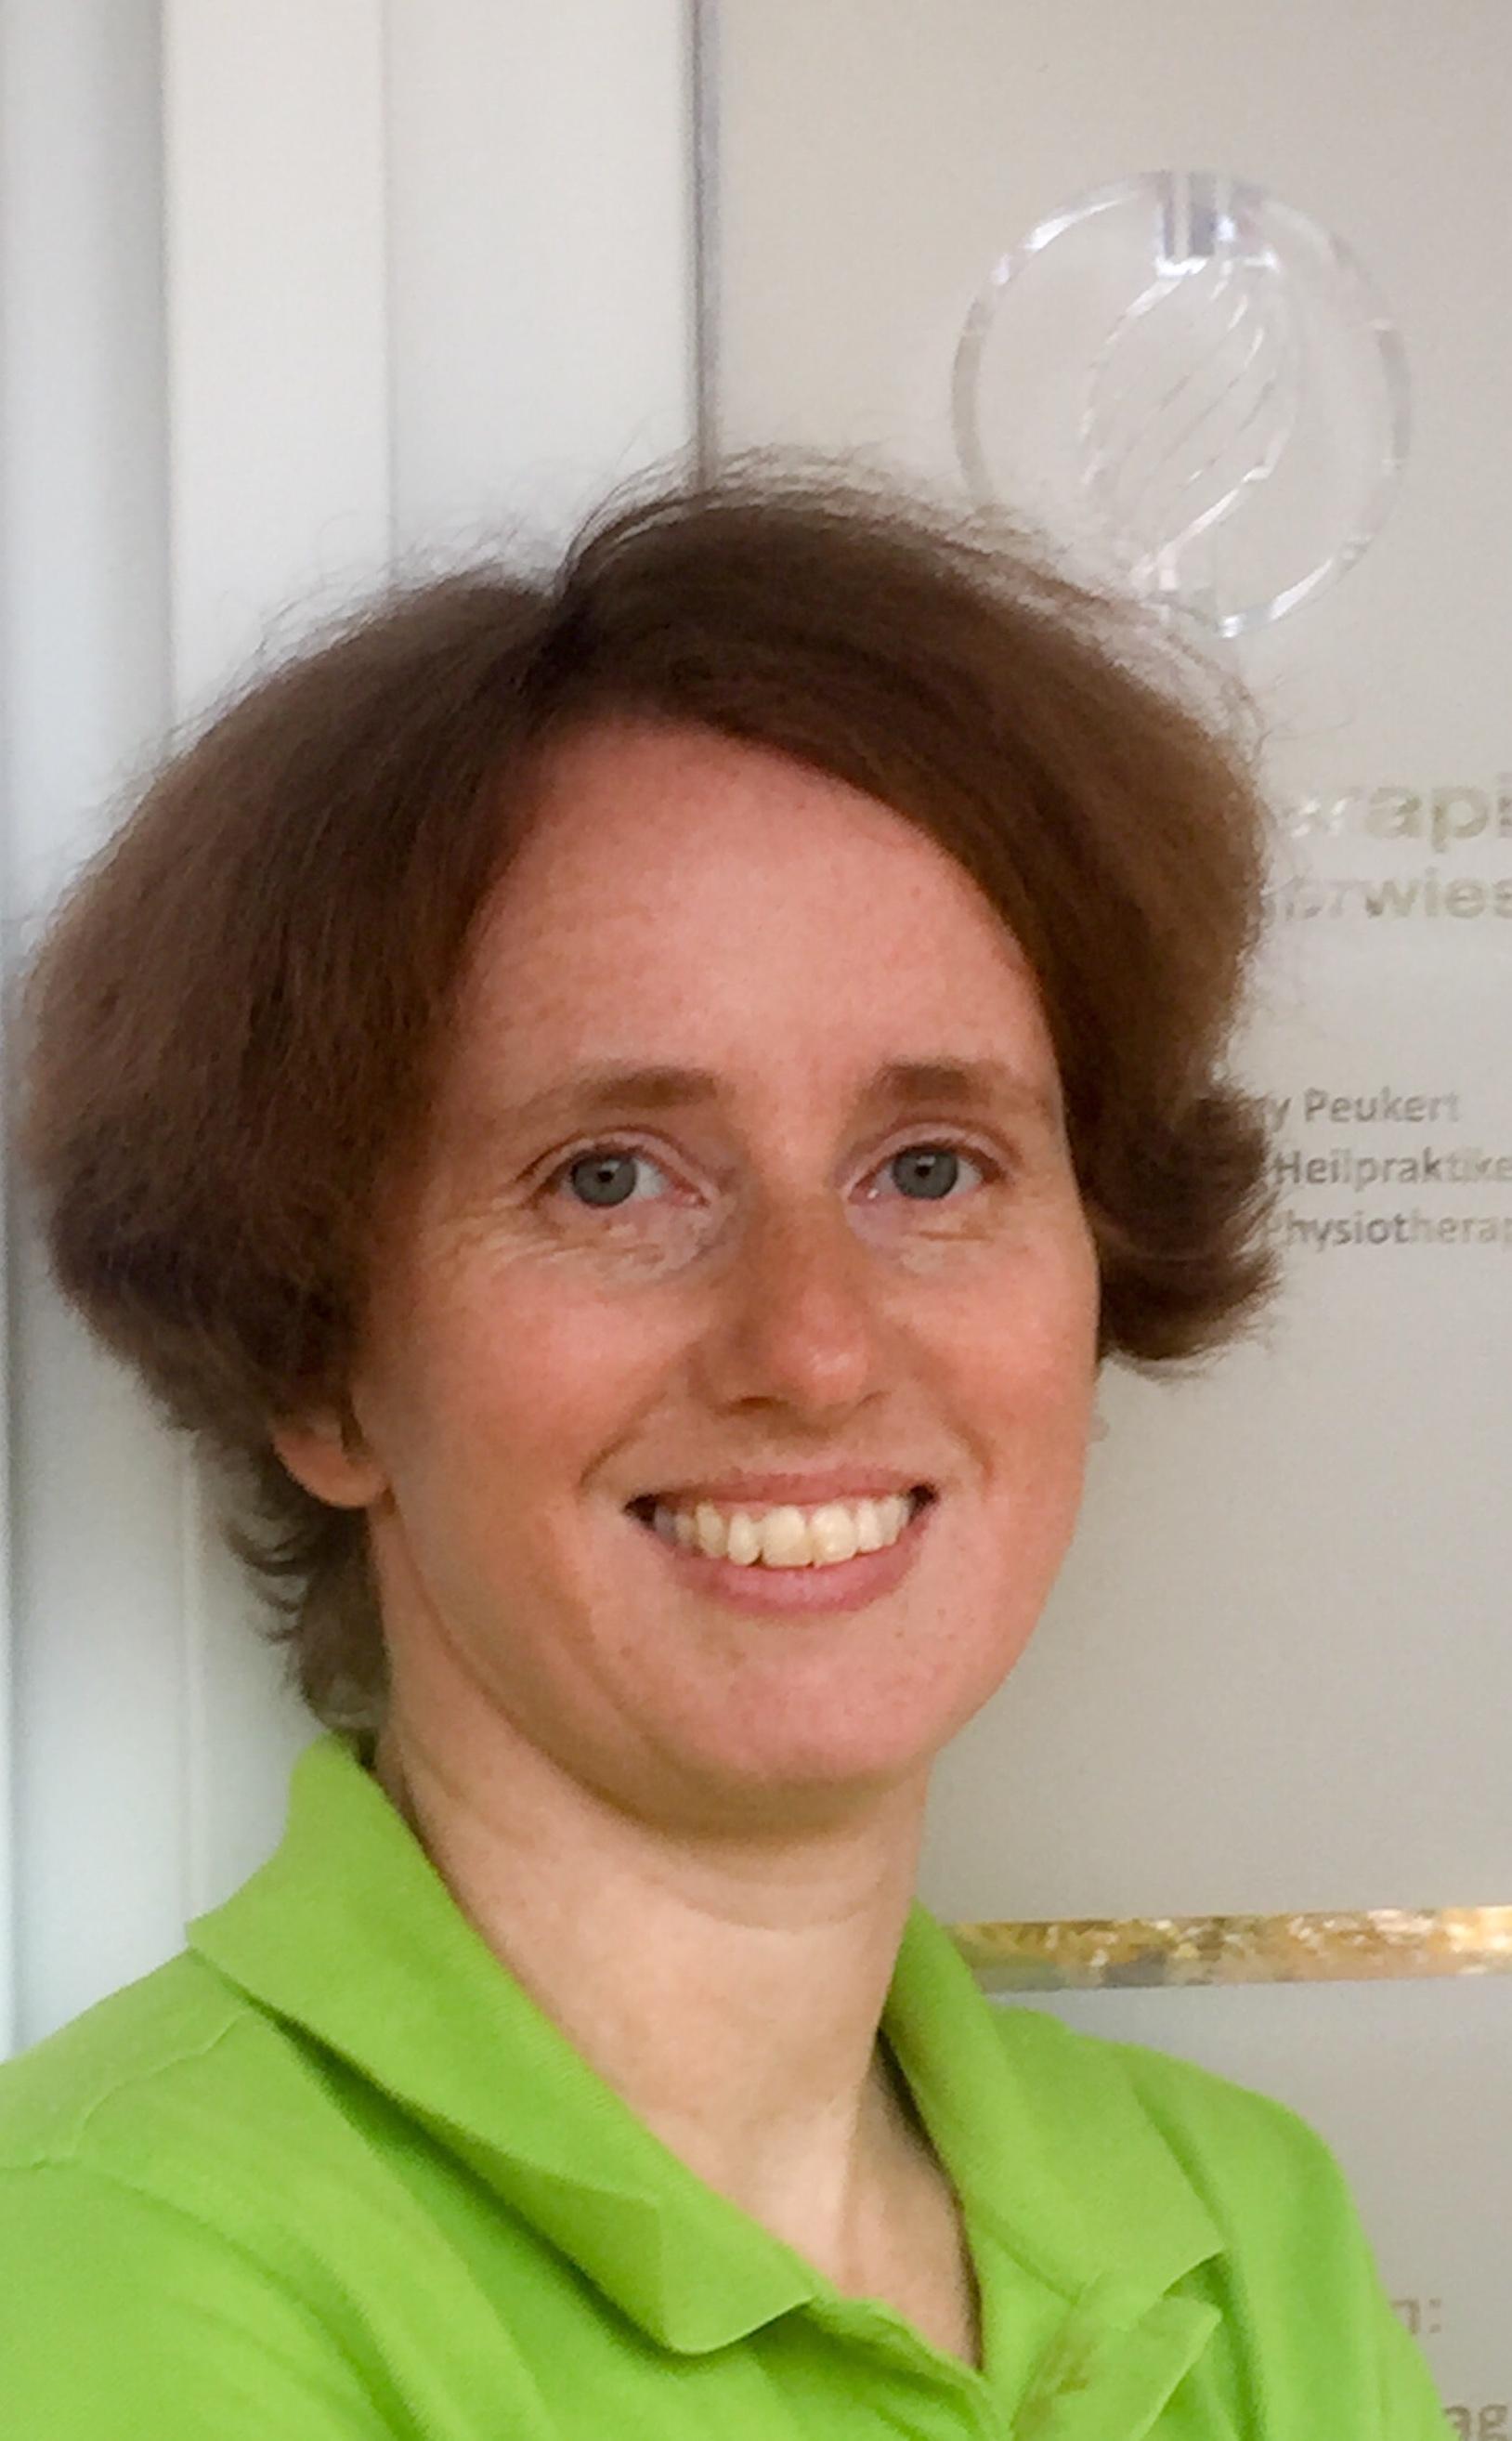 Fanny Peukert